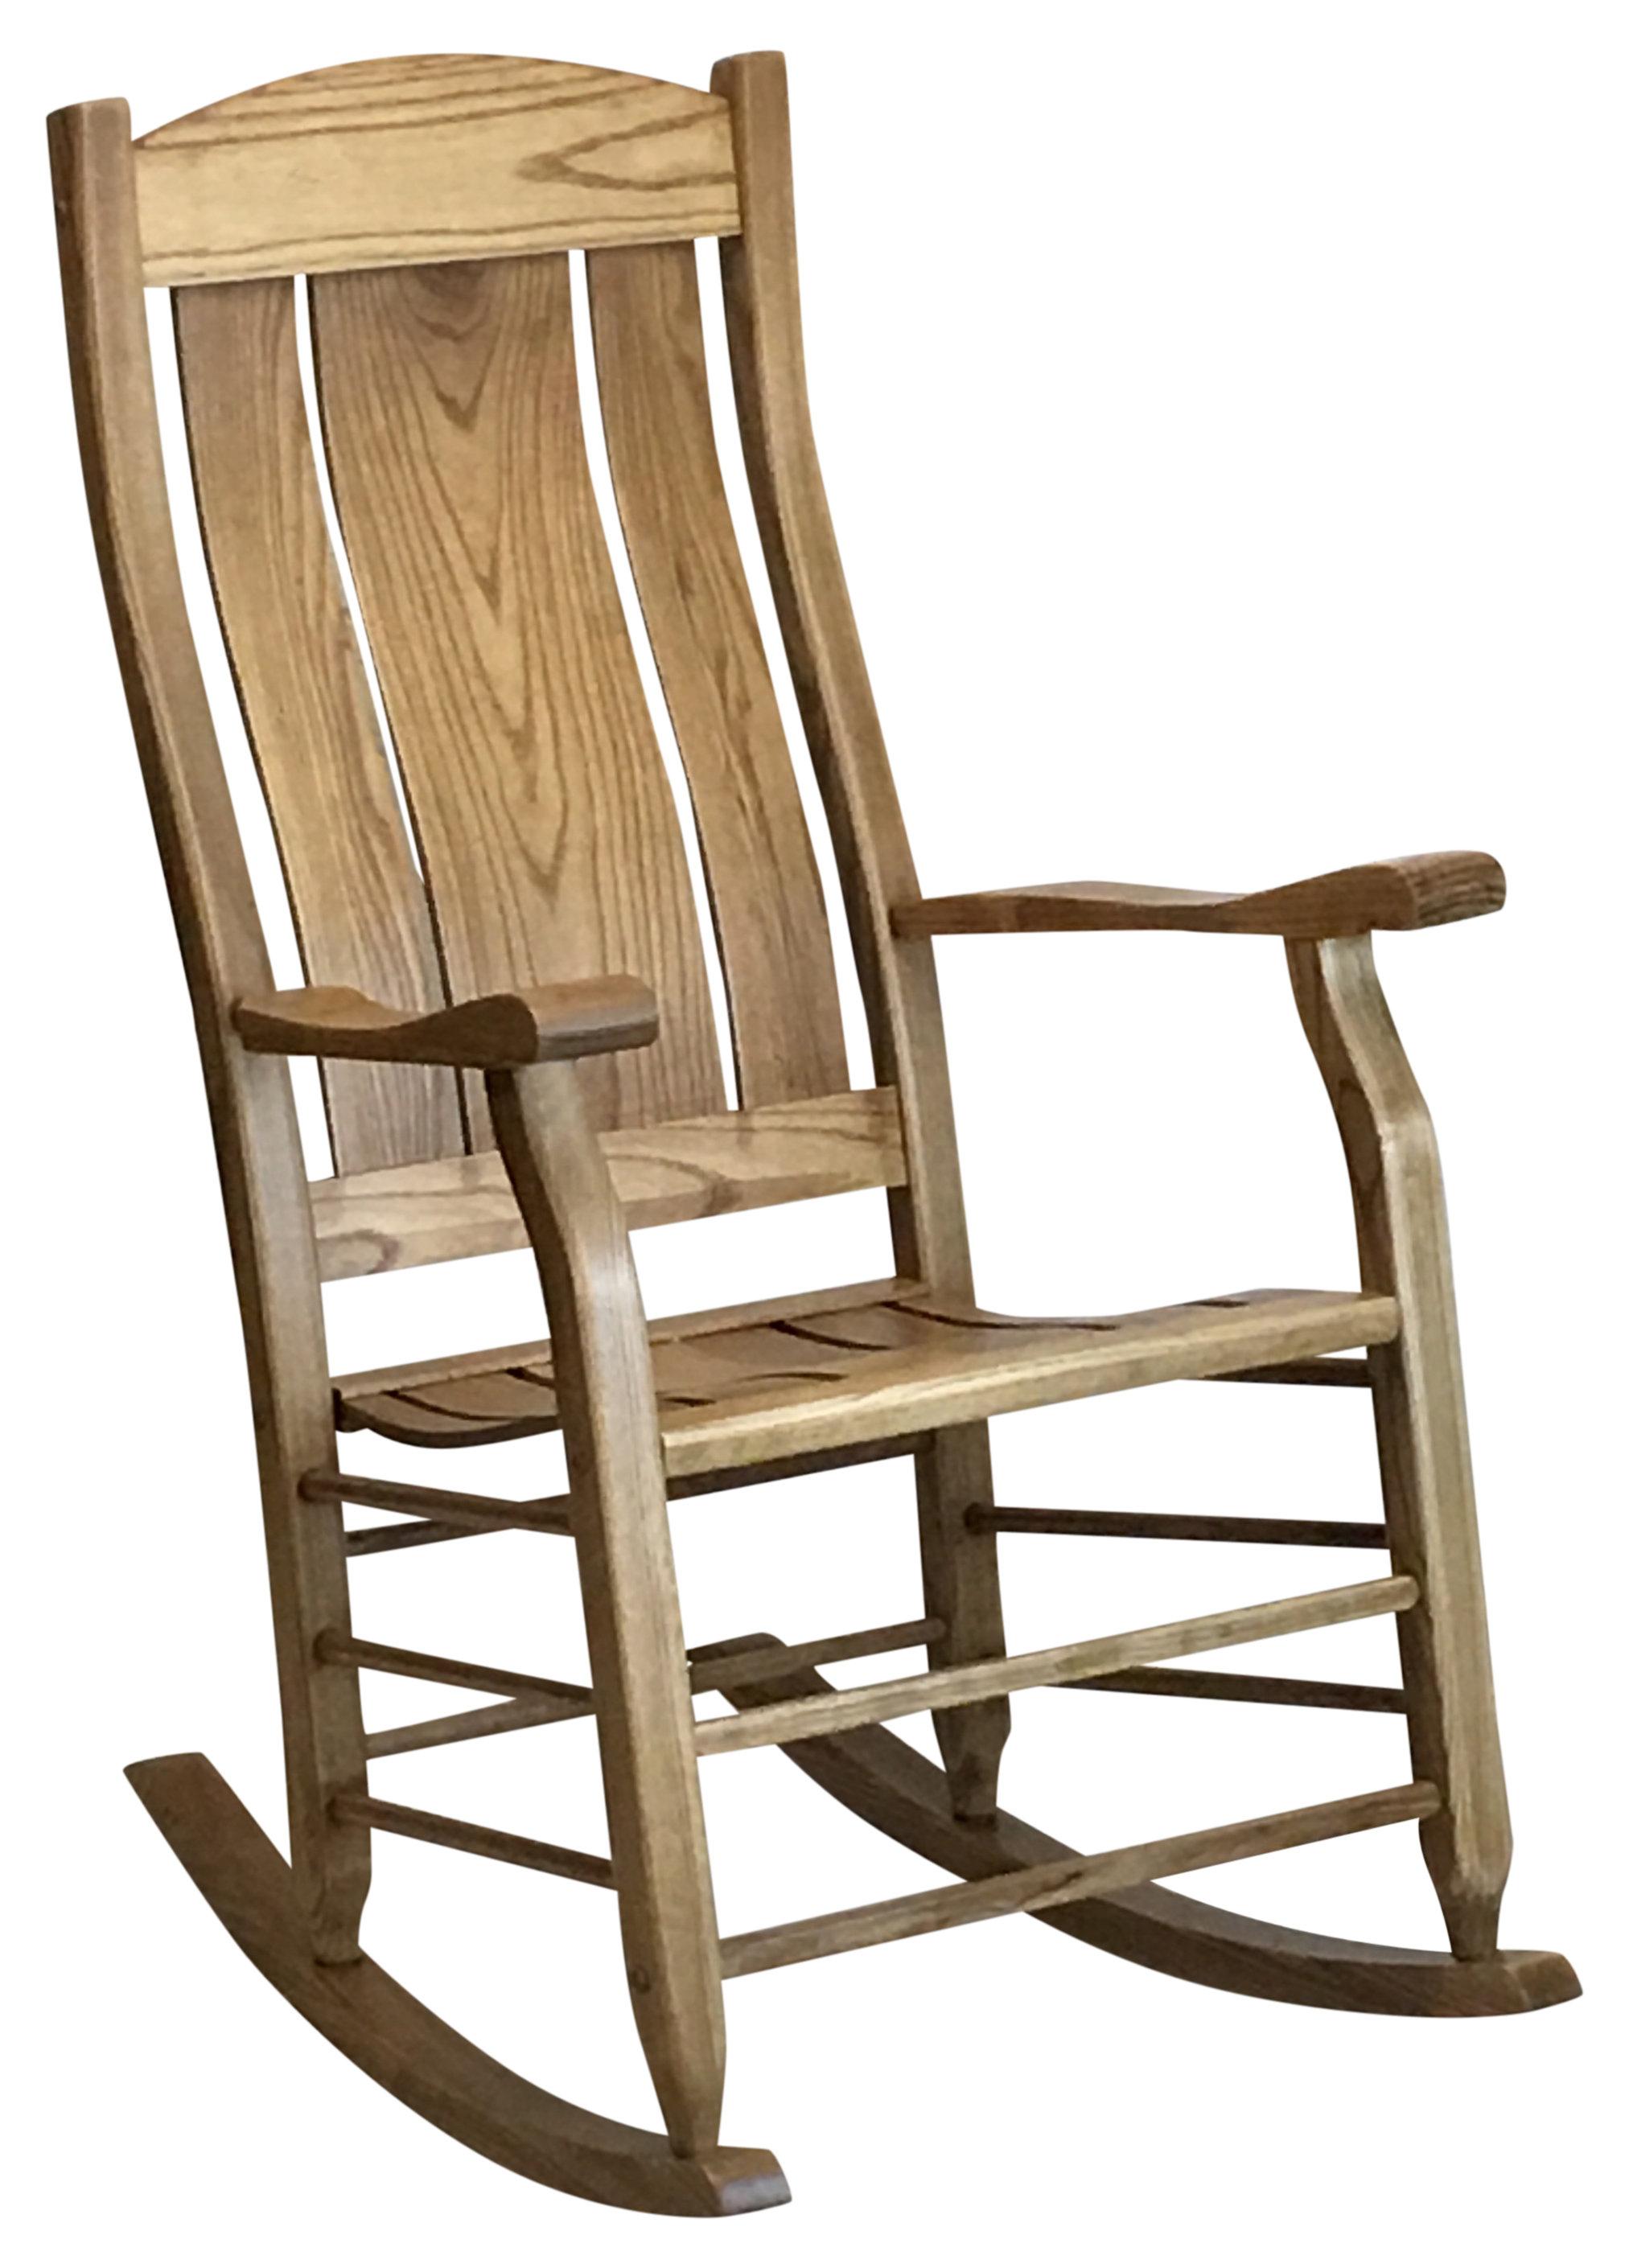 Inspiration about Grindle Slat Back Rocking Chair Within Warm Brown Slat Back Rocking Chairs (#3 of 20)